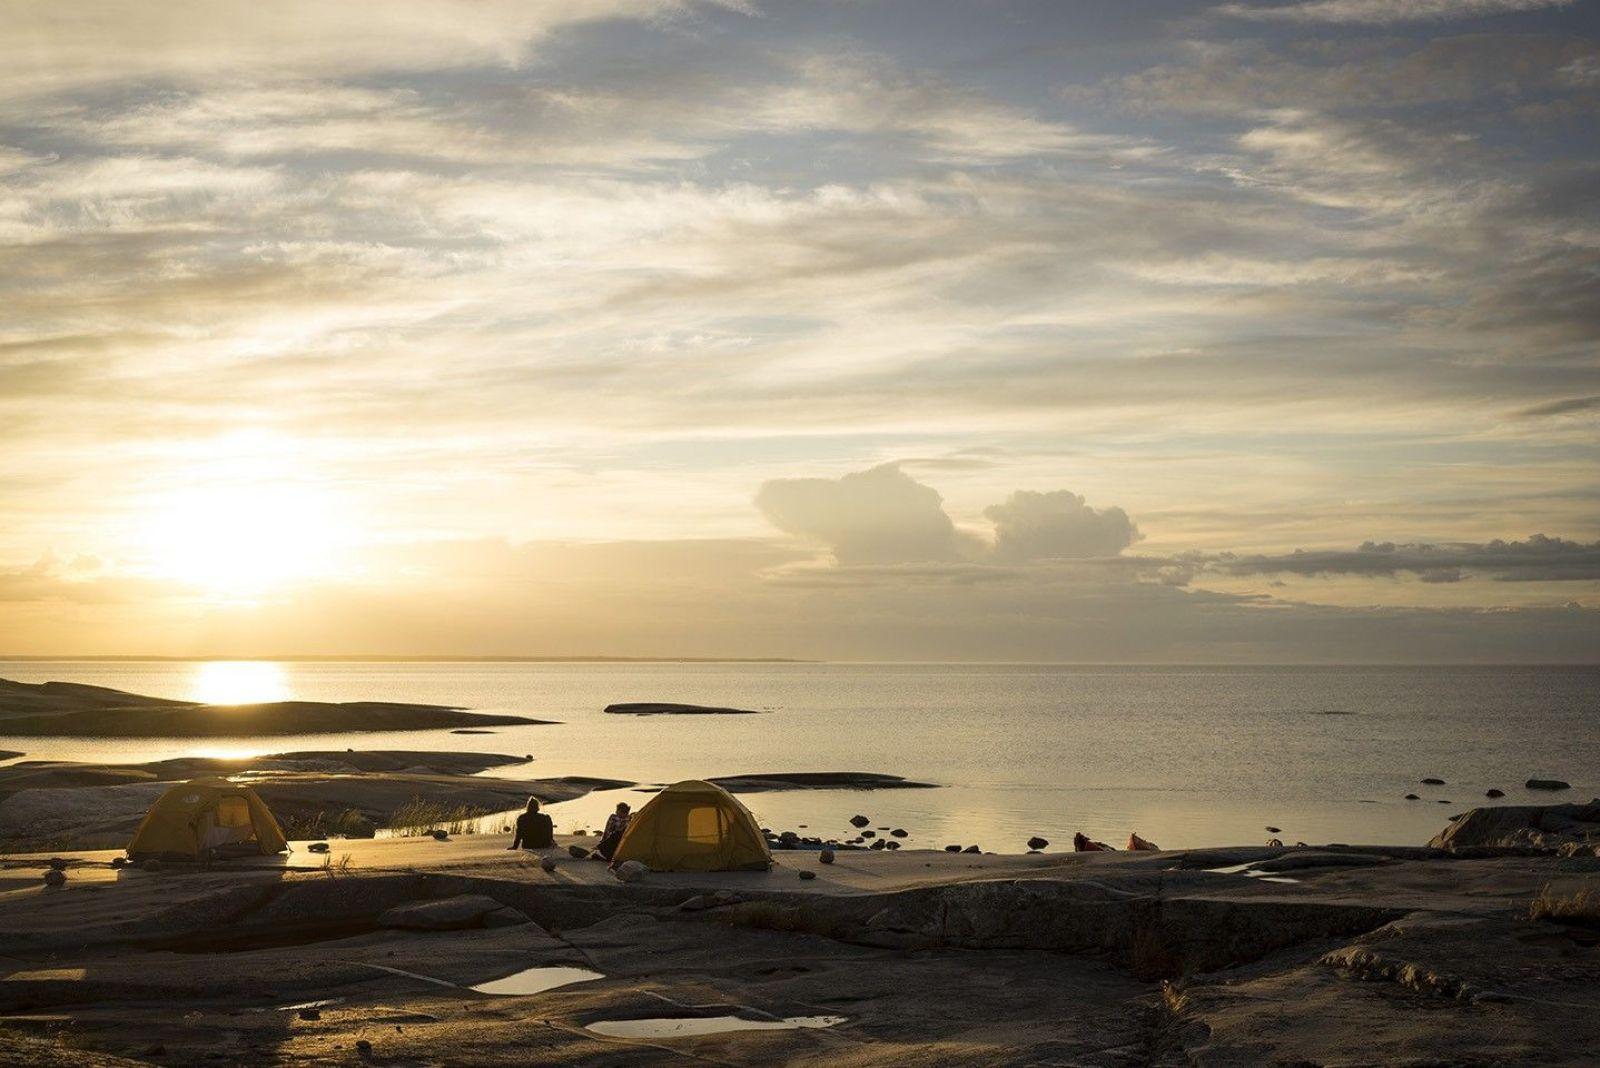 Fejan camping sommar 2021